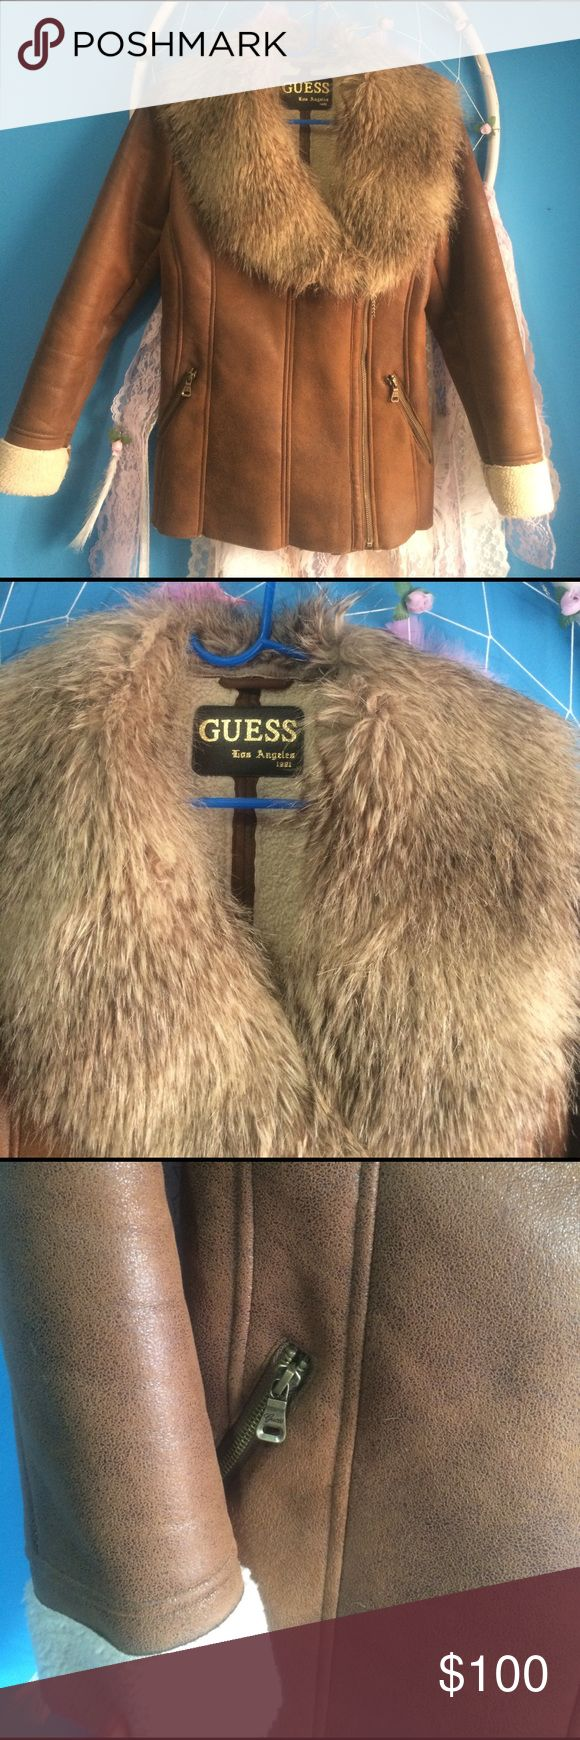 Guess jacket. Fur leather jacket, Jackets, Fur jacket